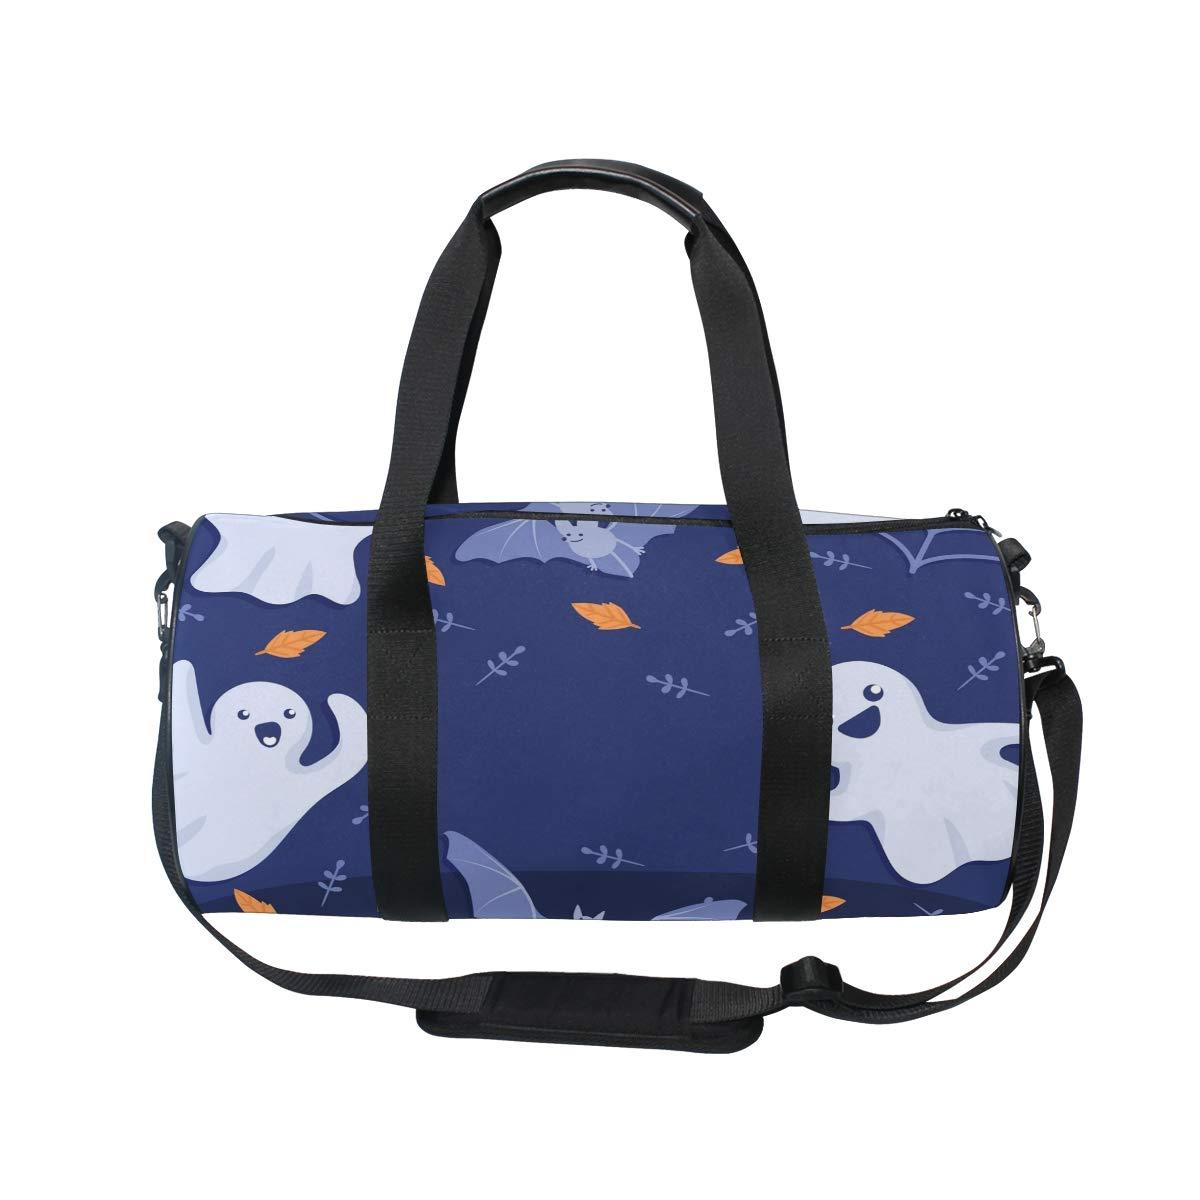 MALPLENA New Gold Christmas Trees Drum gym duffel bag women Travel Bag